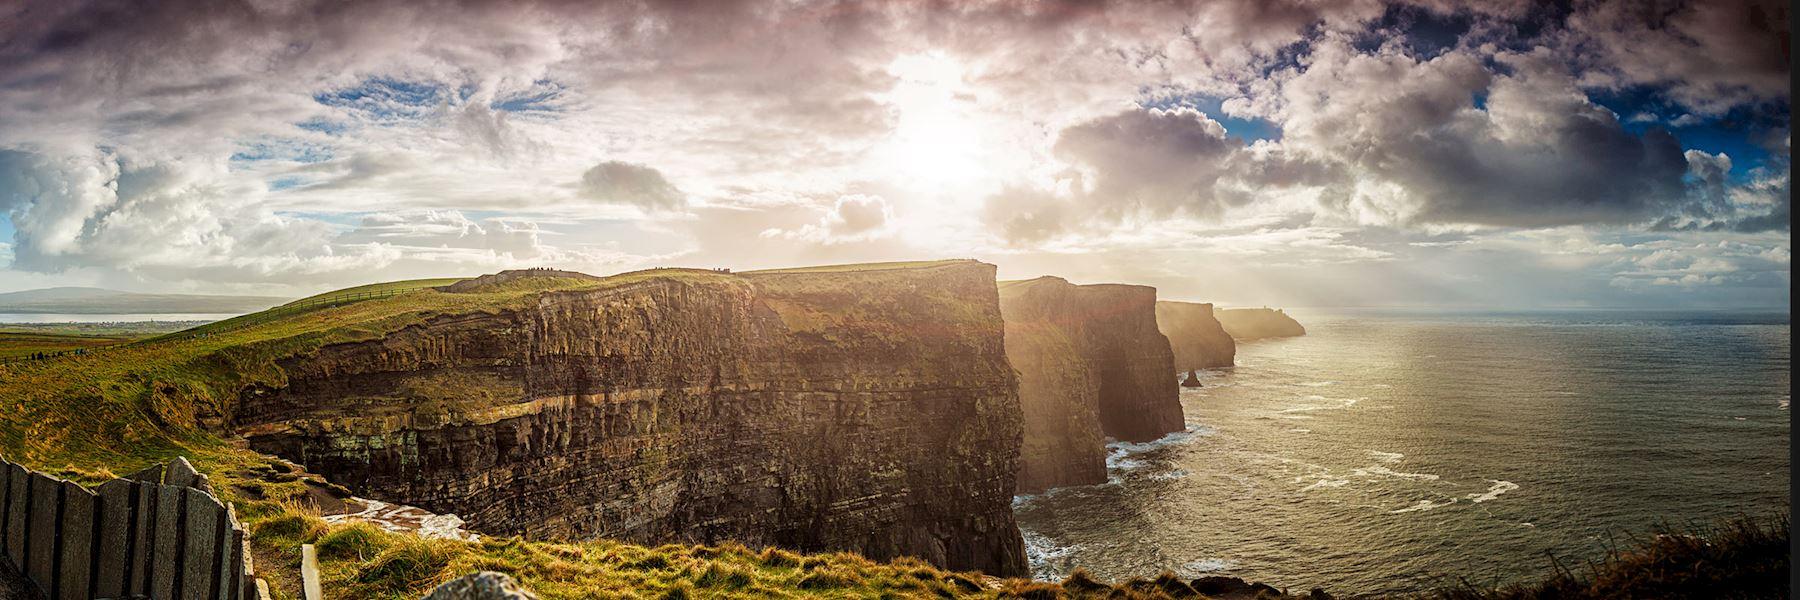 Ireland Vacations Tailormade Ireland Tours Audley Travel - Irish vacations